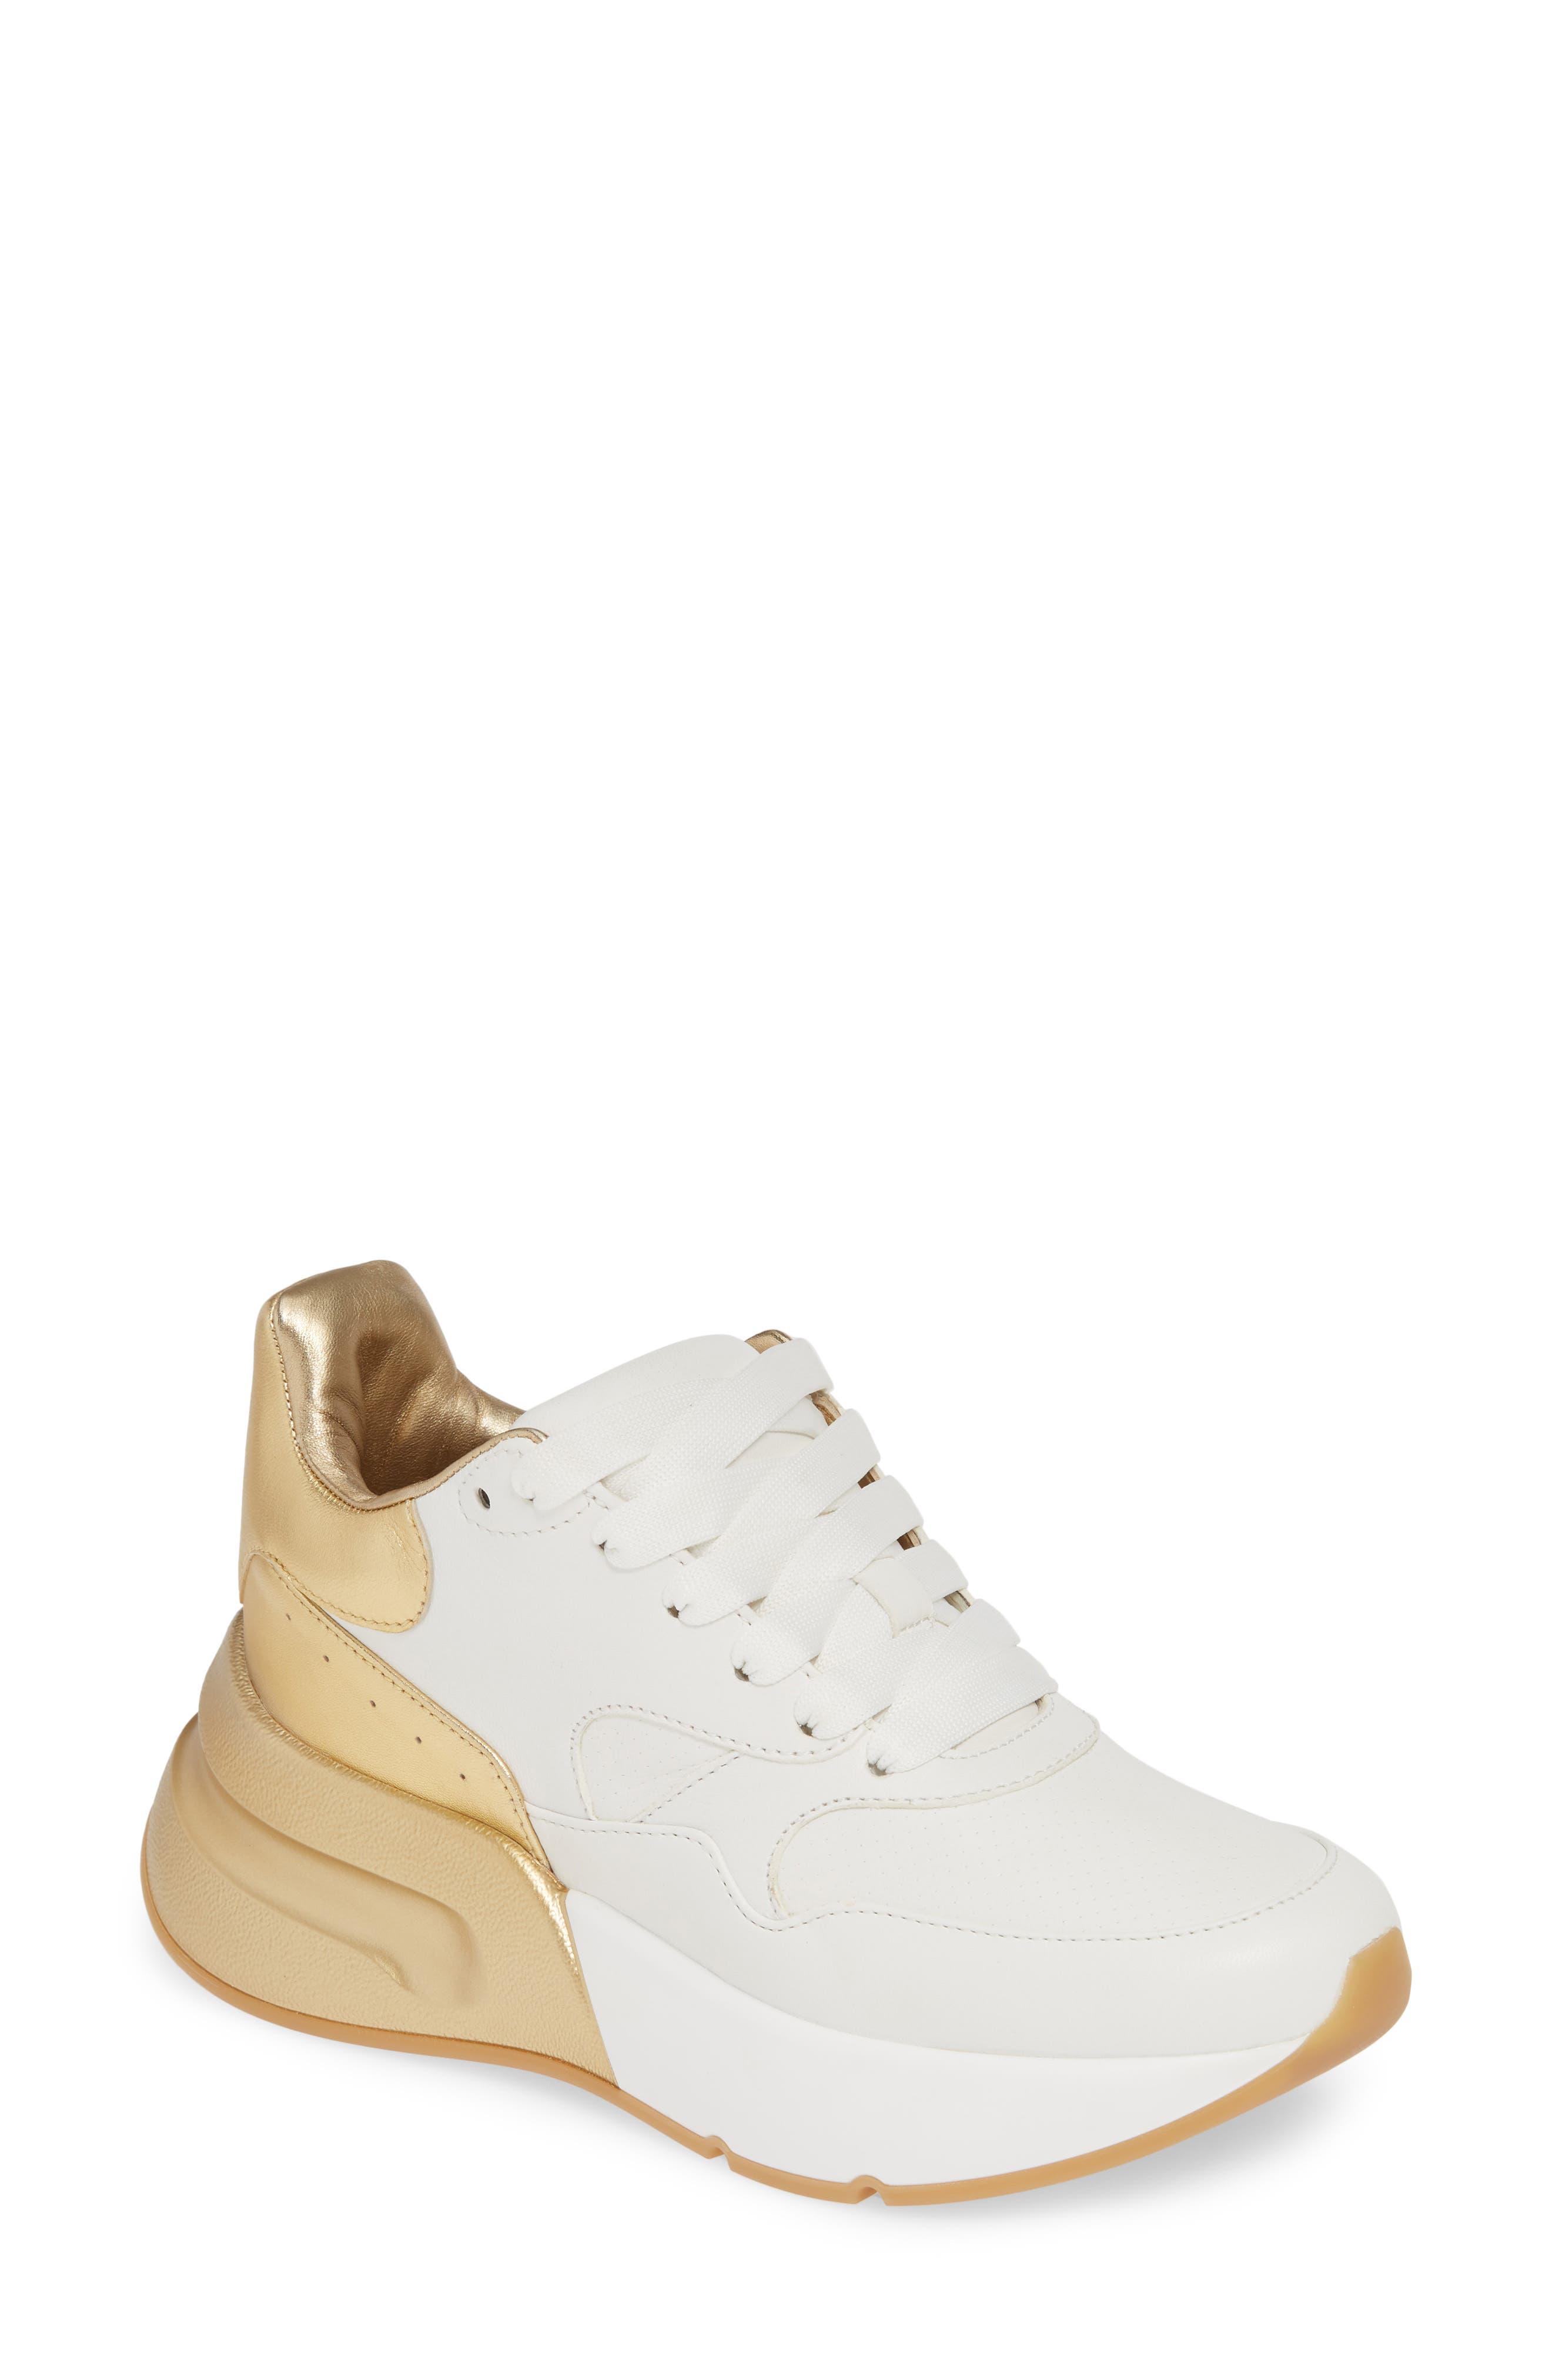 Alexander Mcqueen Platform Sneaker, White